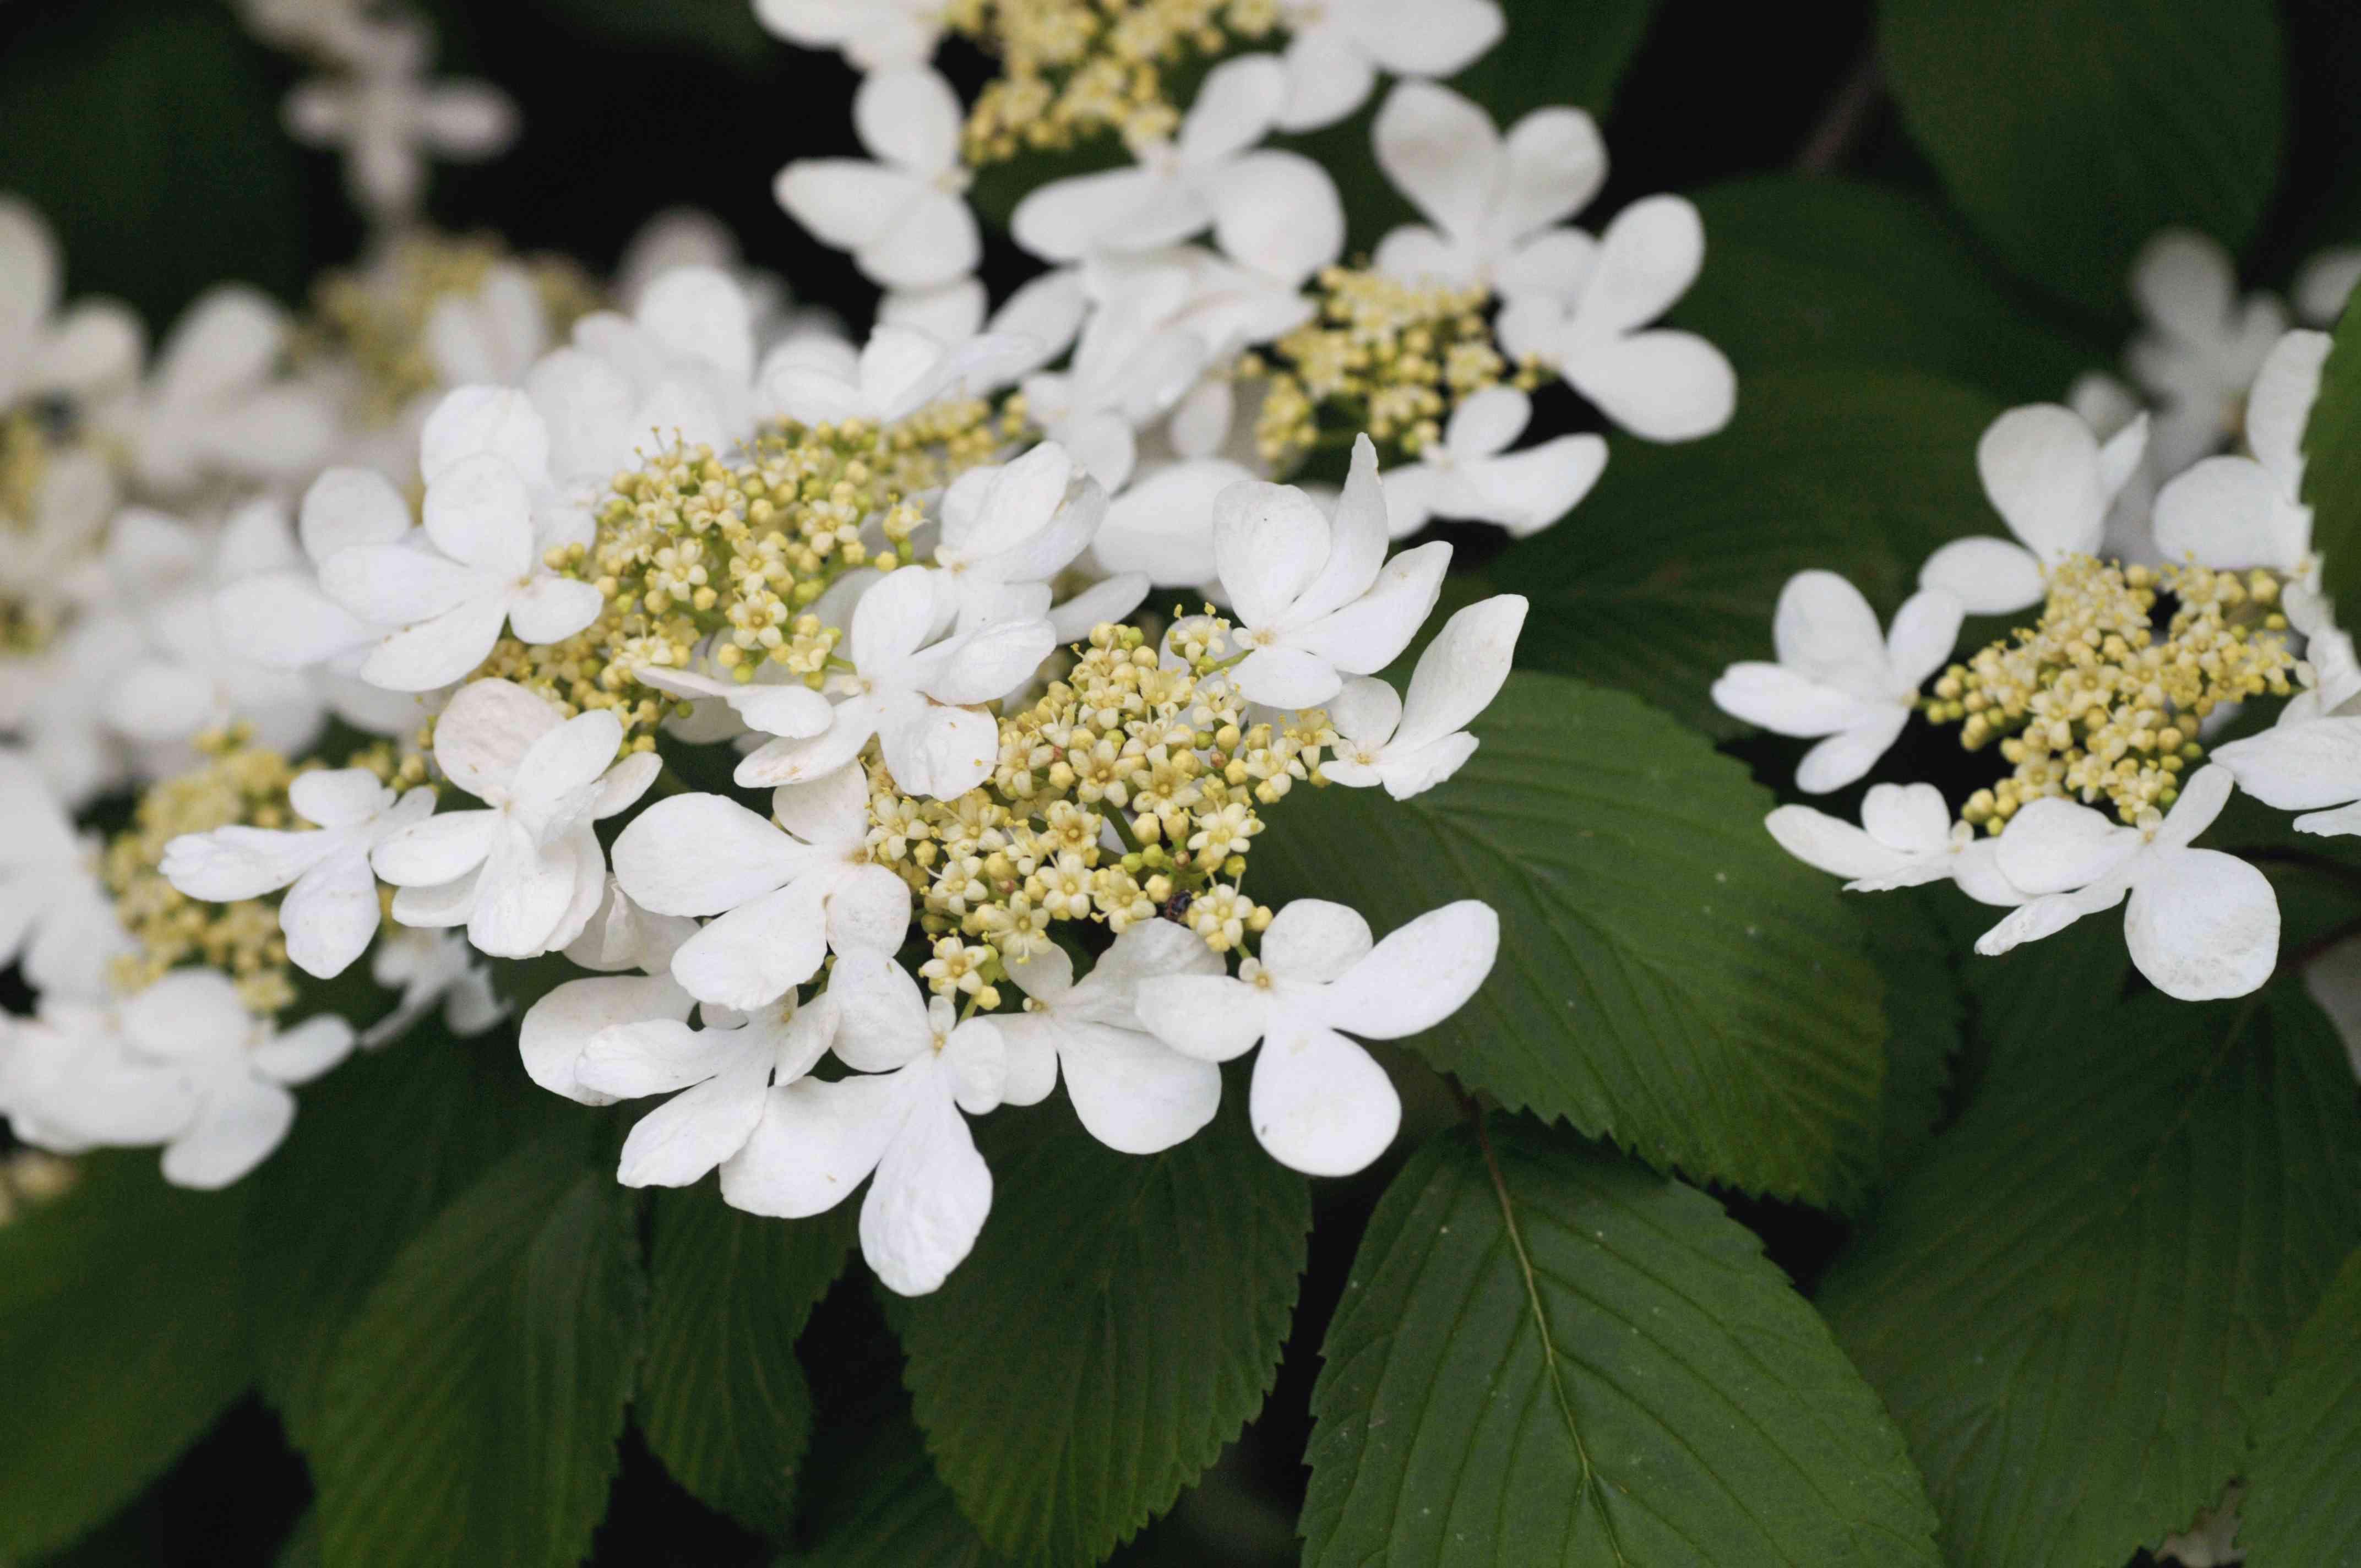 Doublefile viburnum shrub small white flower clusters closeup